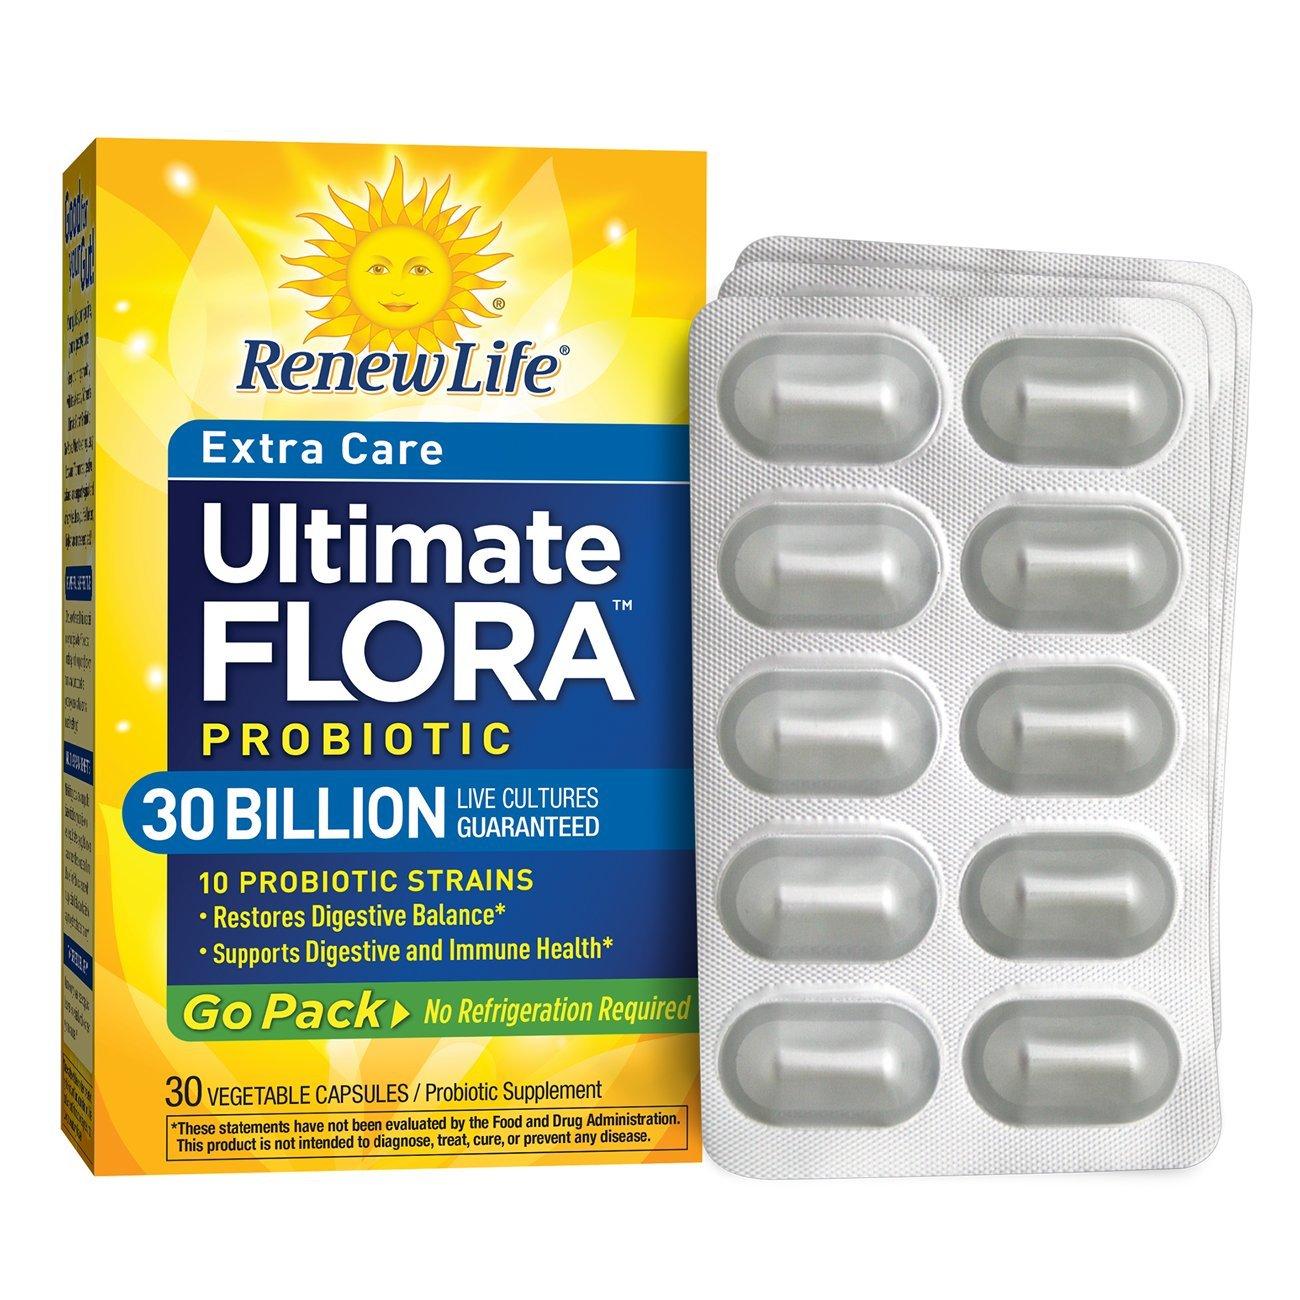 Renew Life - Ultimate Flora Probiotic Extra Care - 30 billion - 30 vegetable capsules - Go Pack